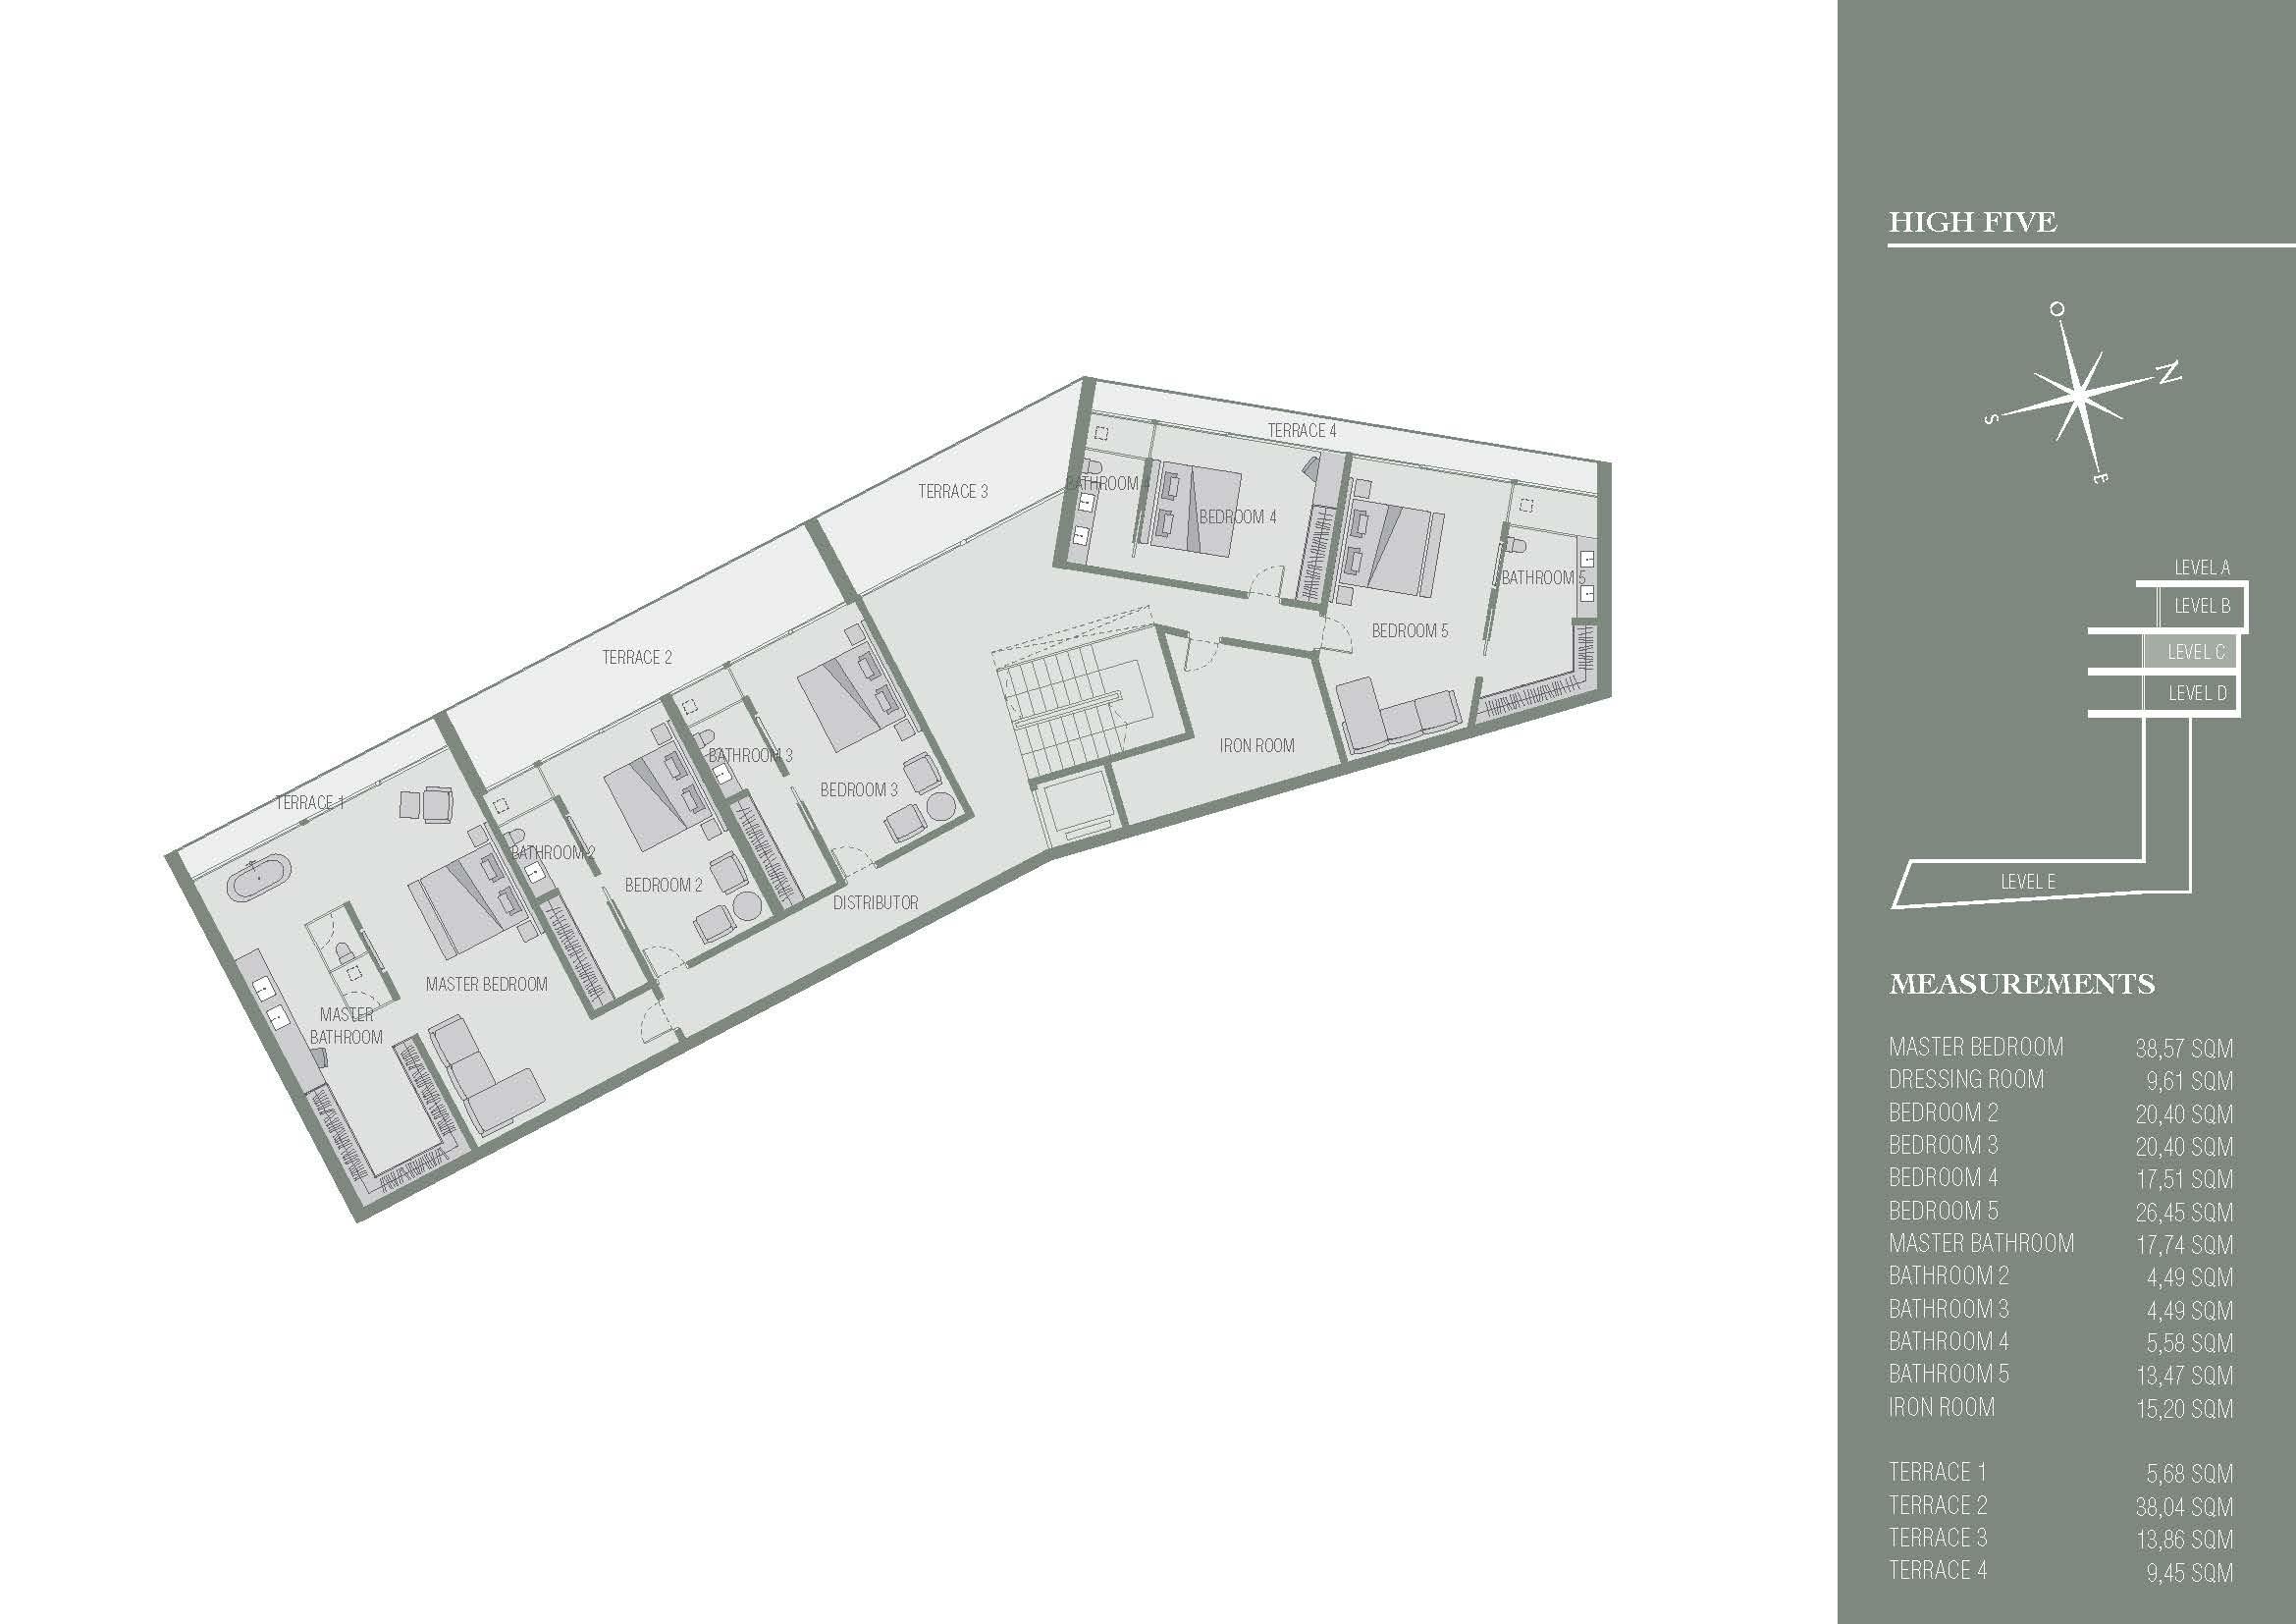 Grundriss - 1. Etage